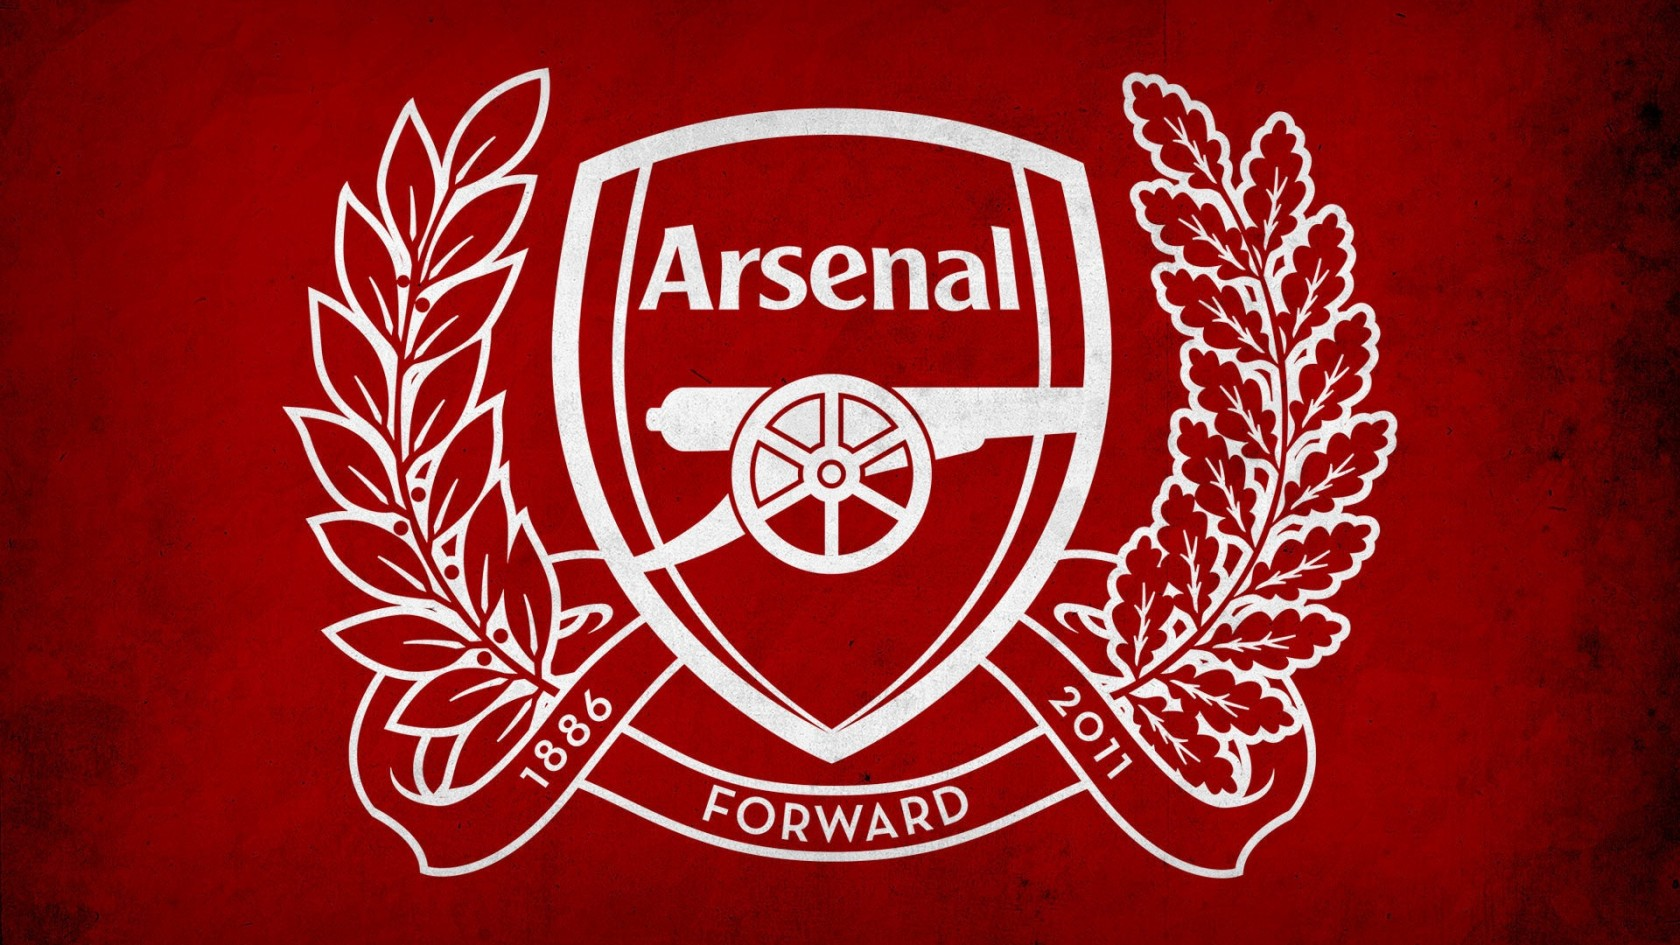 Arsenal 2013/14 Outlook - The Center Circle - A SoccerPro